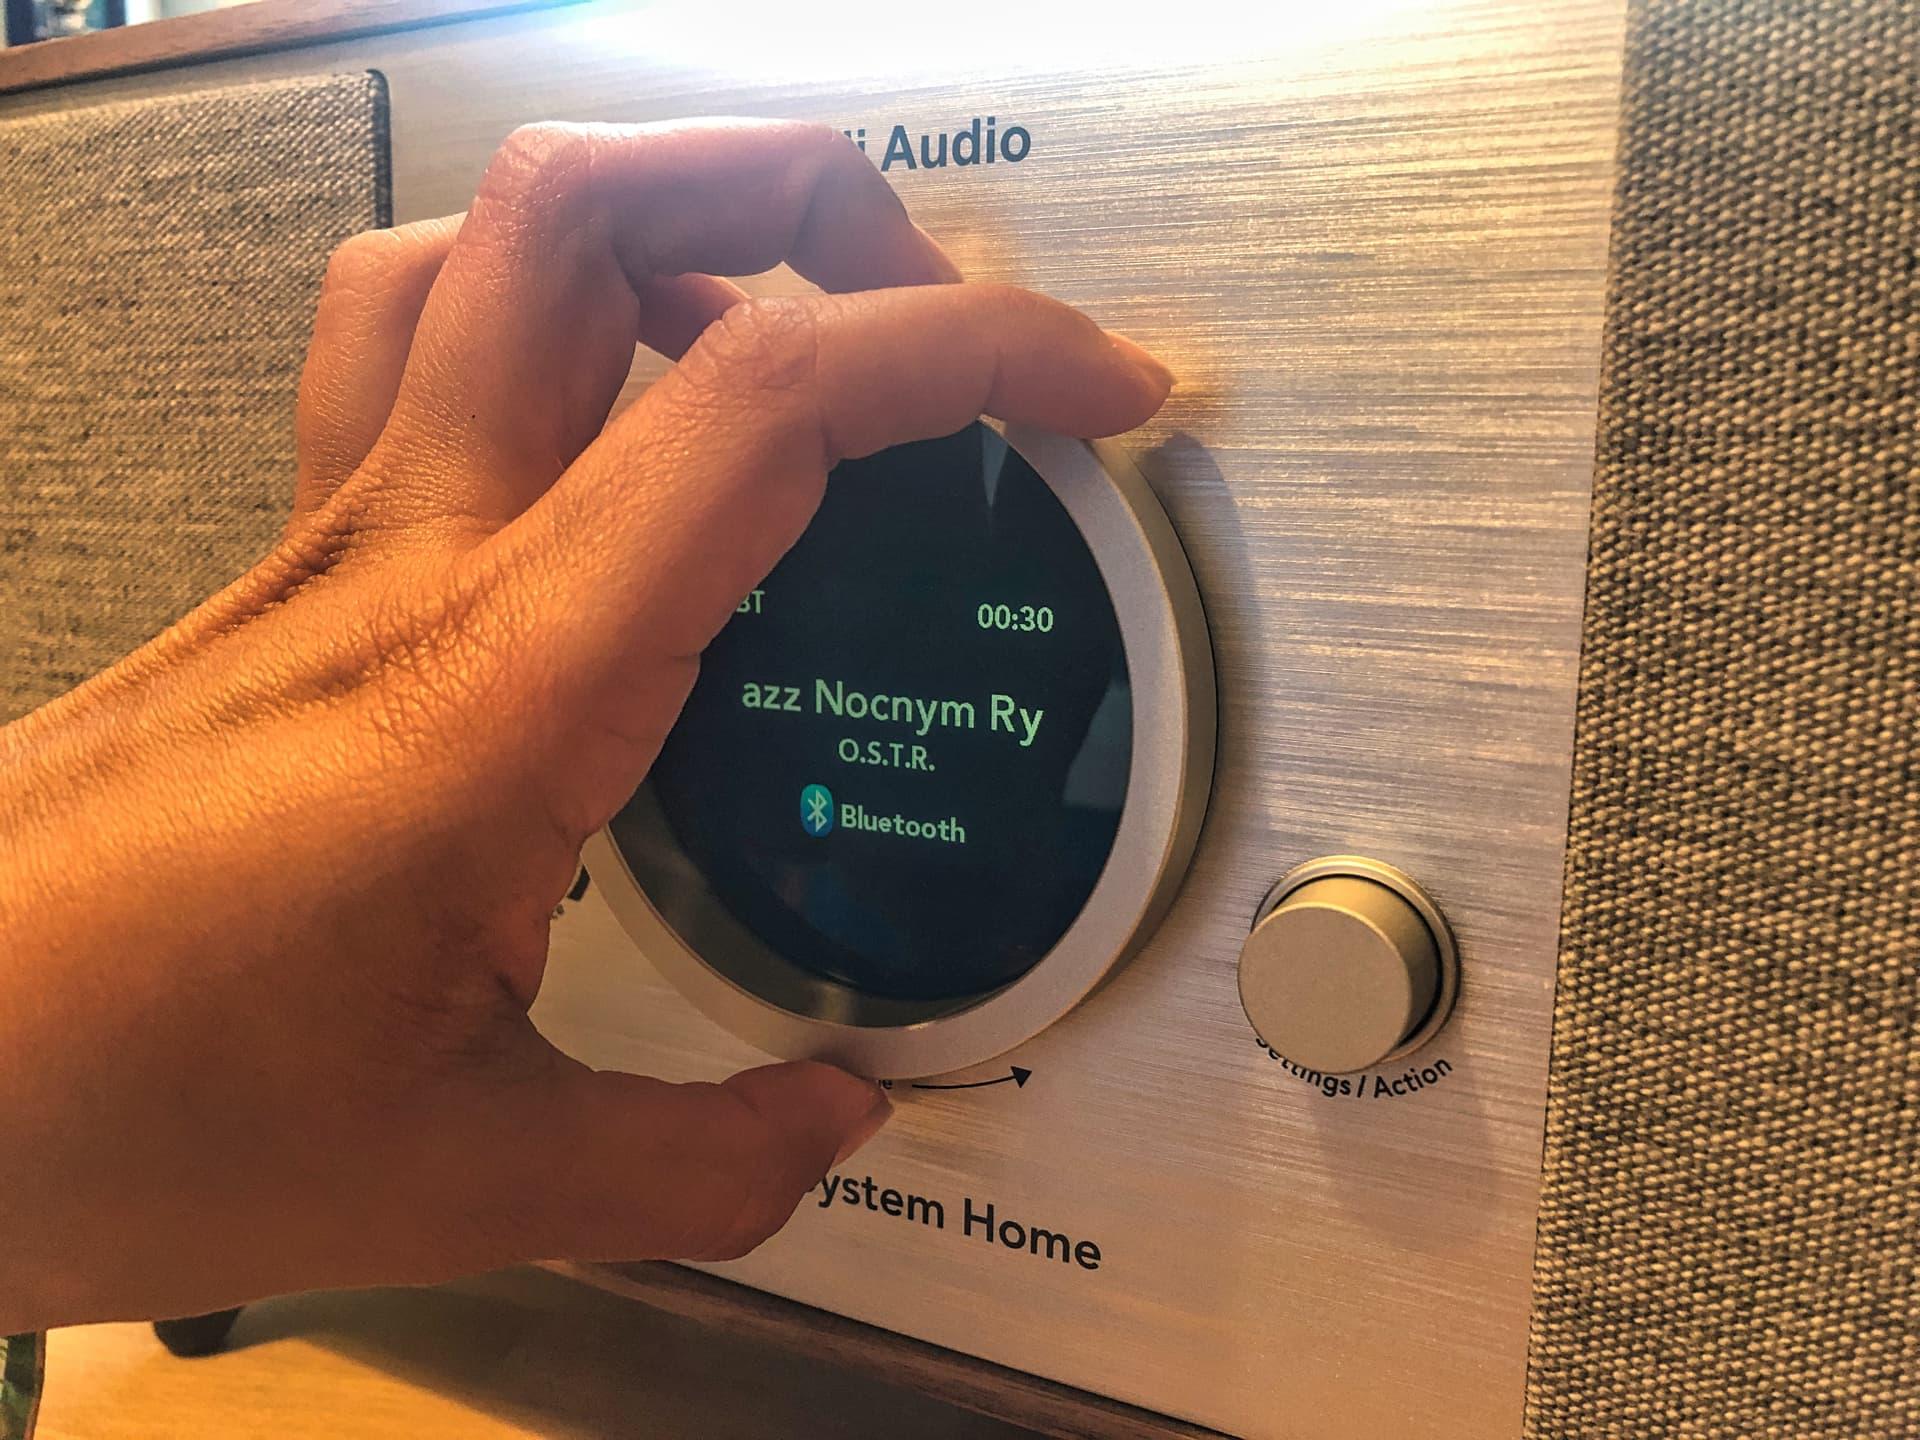 Tivoli Audio Music System Home pokrętło